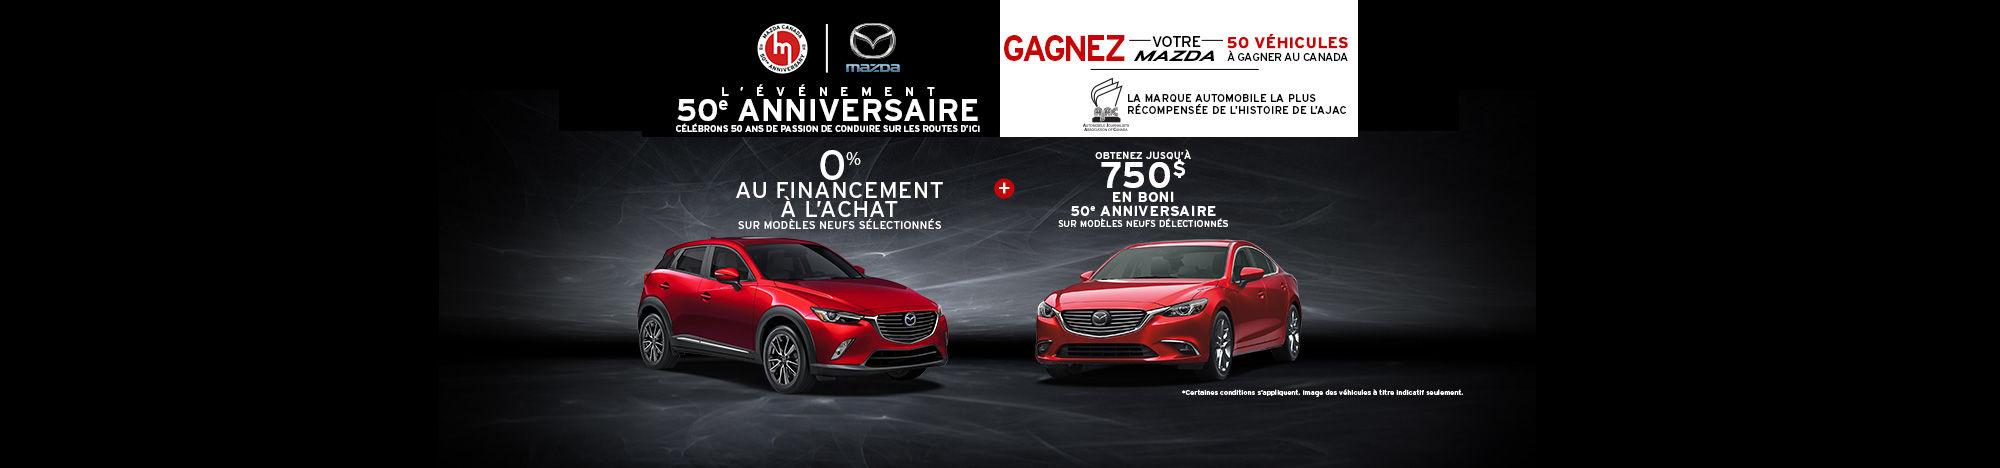 Événement mensuel Mazda